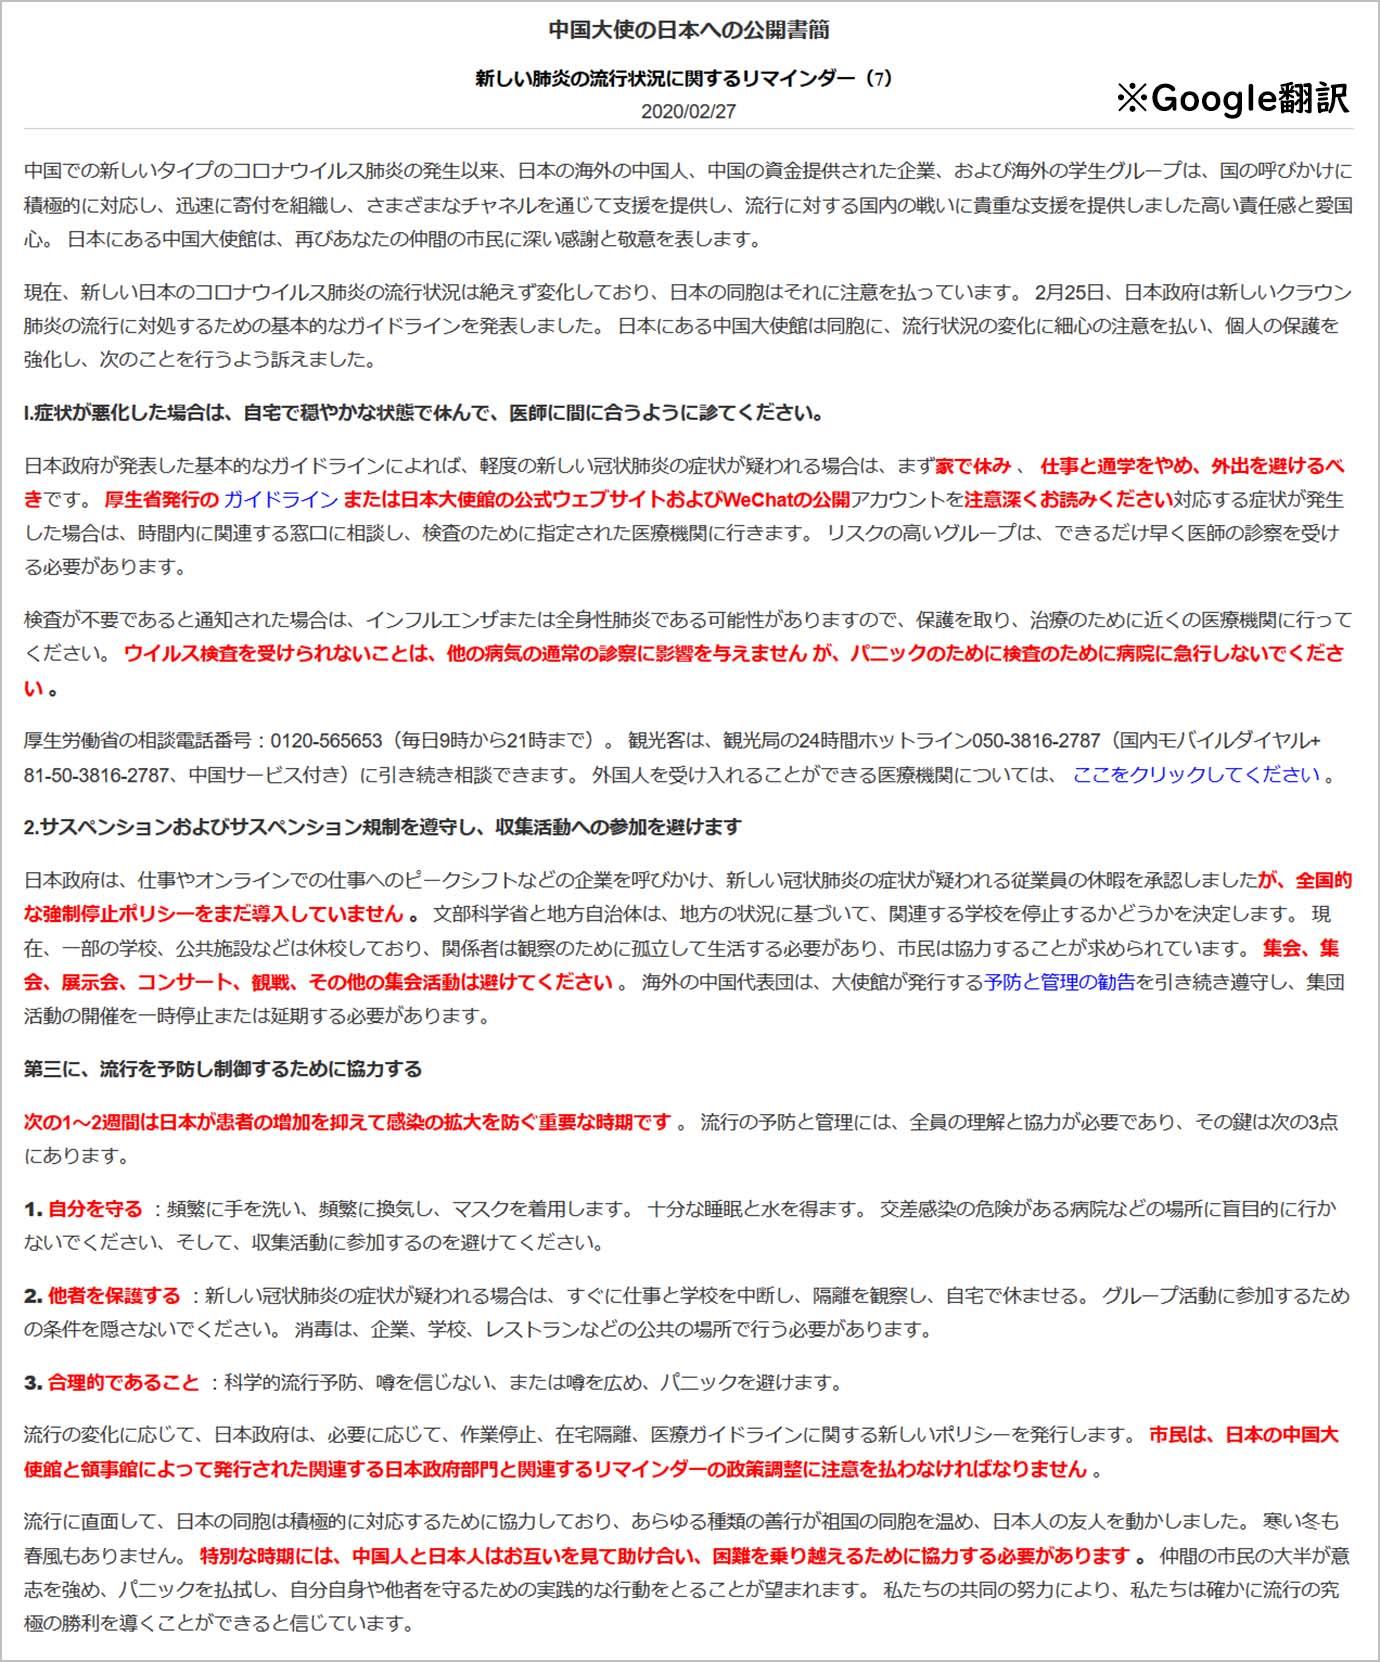 china-image2